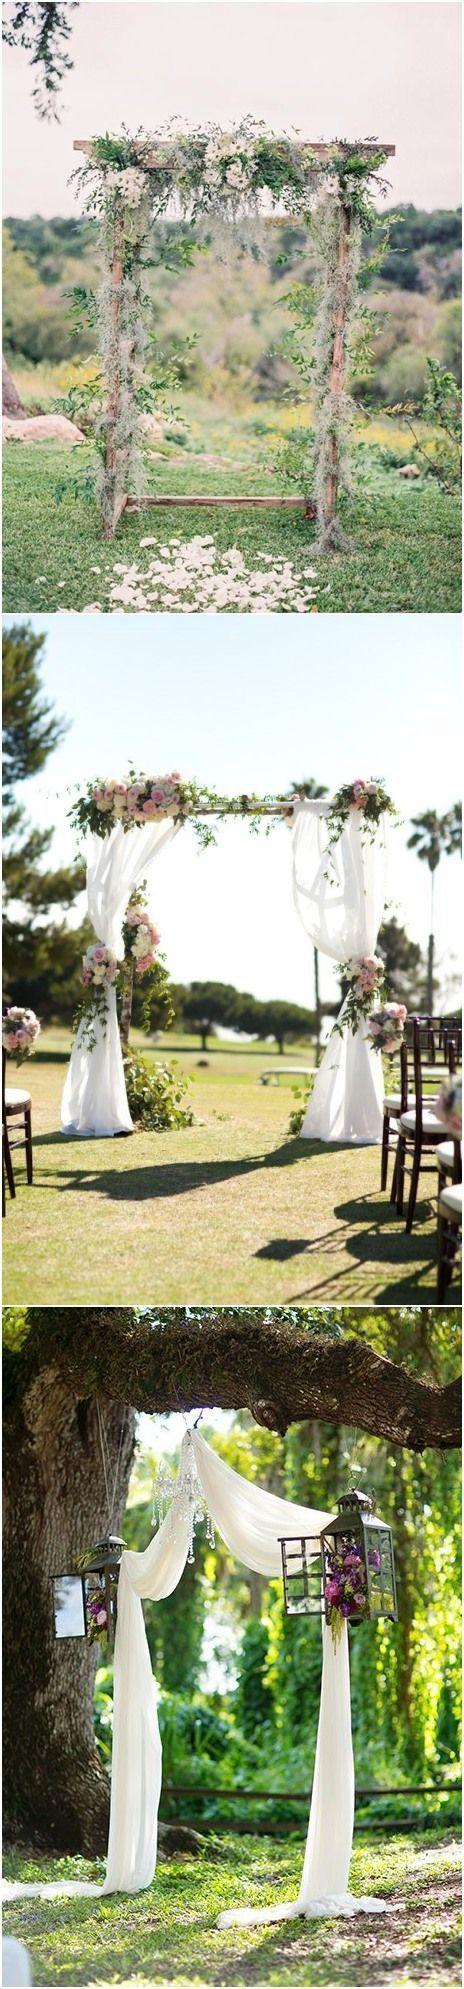 4142 best Outdoor Wedding Tips images on Pinterest   Weddings, Outdoor  weddings and Glamping weddings